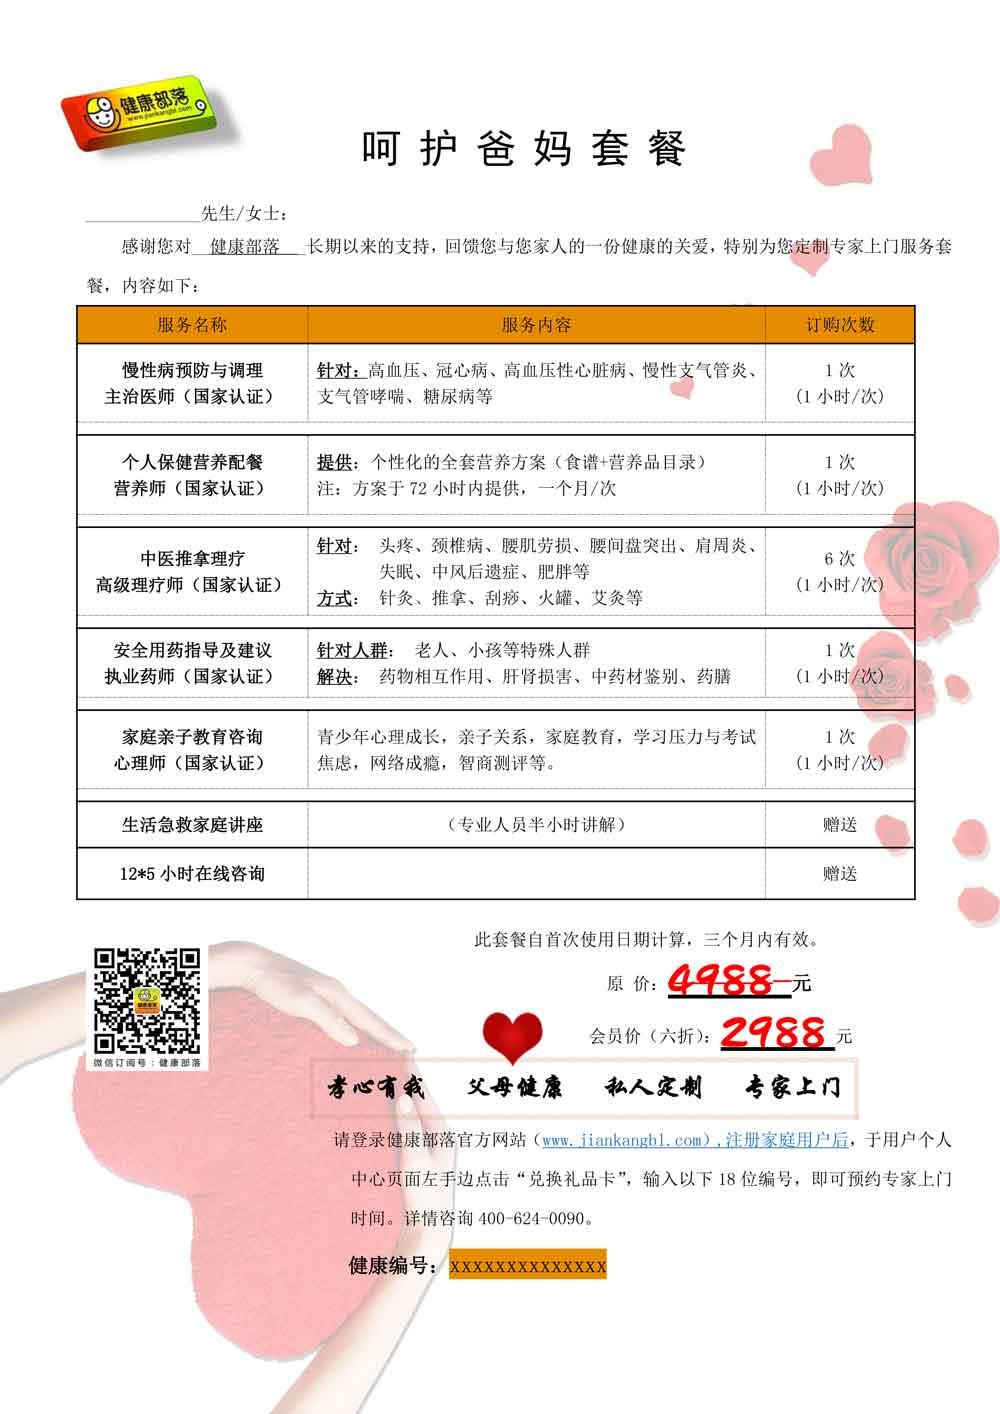 http://www.jiankangbl.com:80/attachment/pic/B4E4DF41-D025-04D5-25B8-559E061084DF.jpg